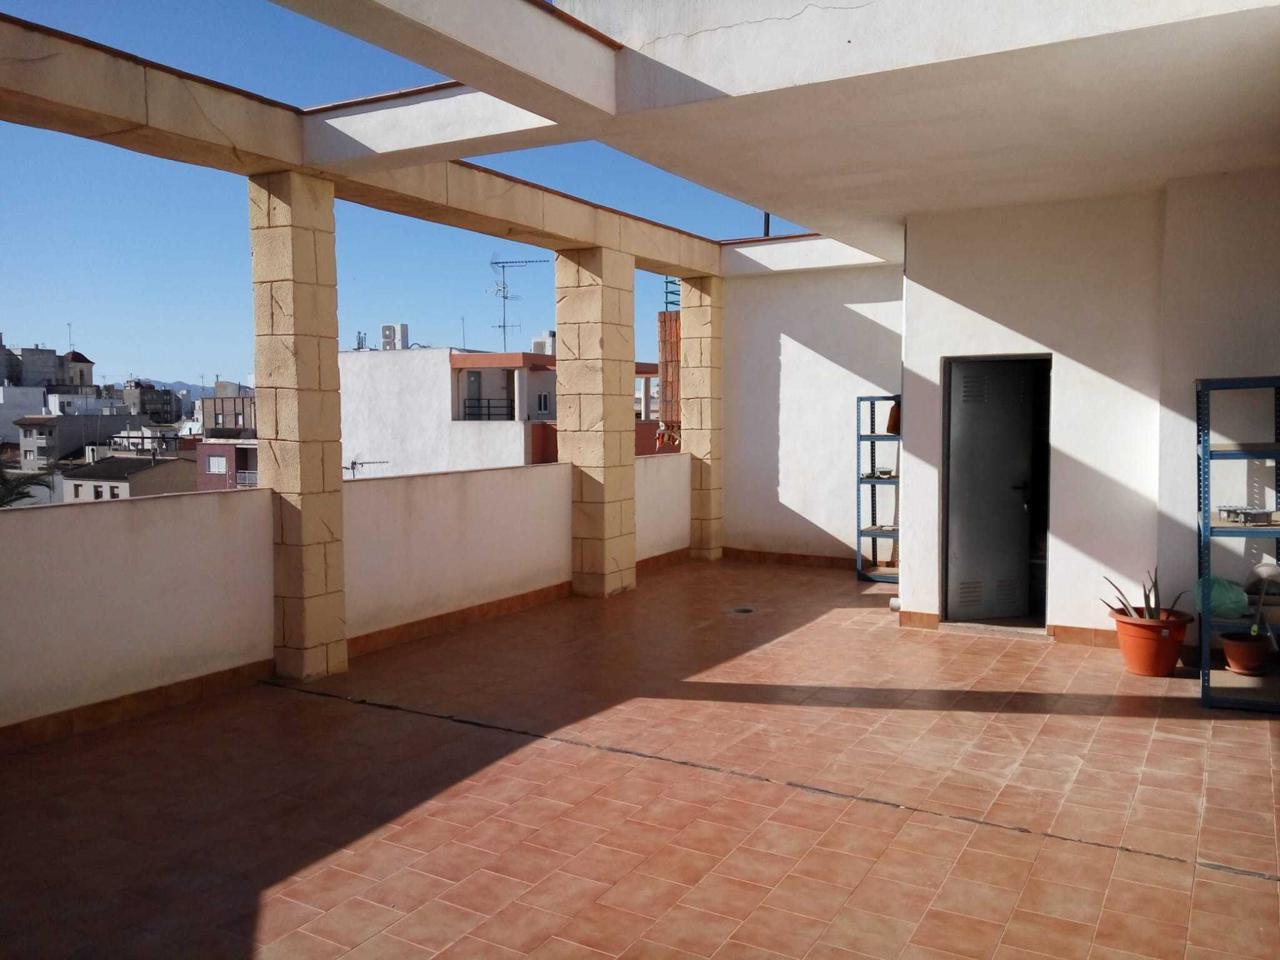 Alquiler Piso  Calle comunidad valenciana. \